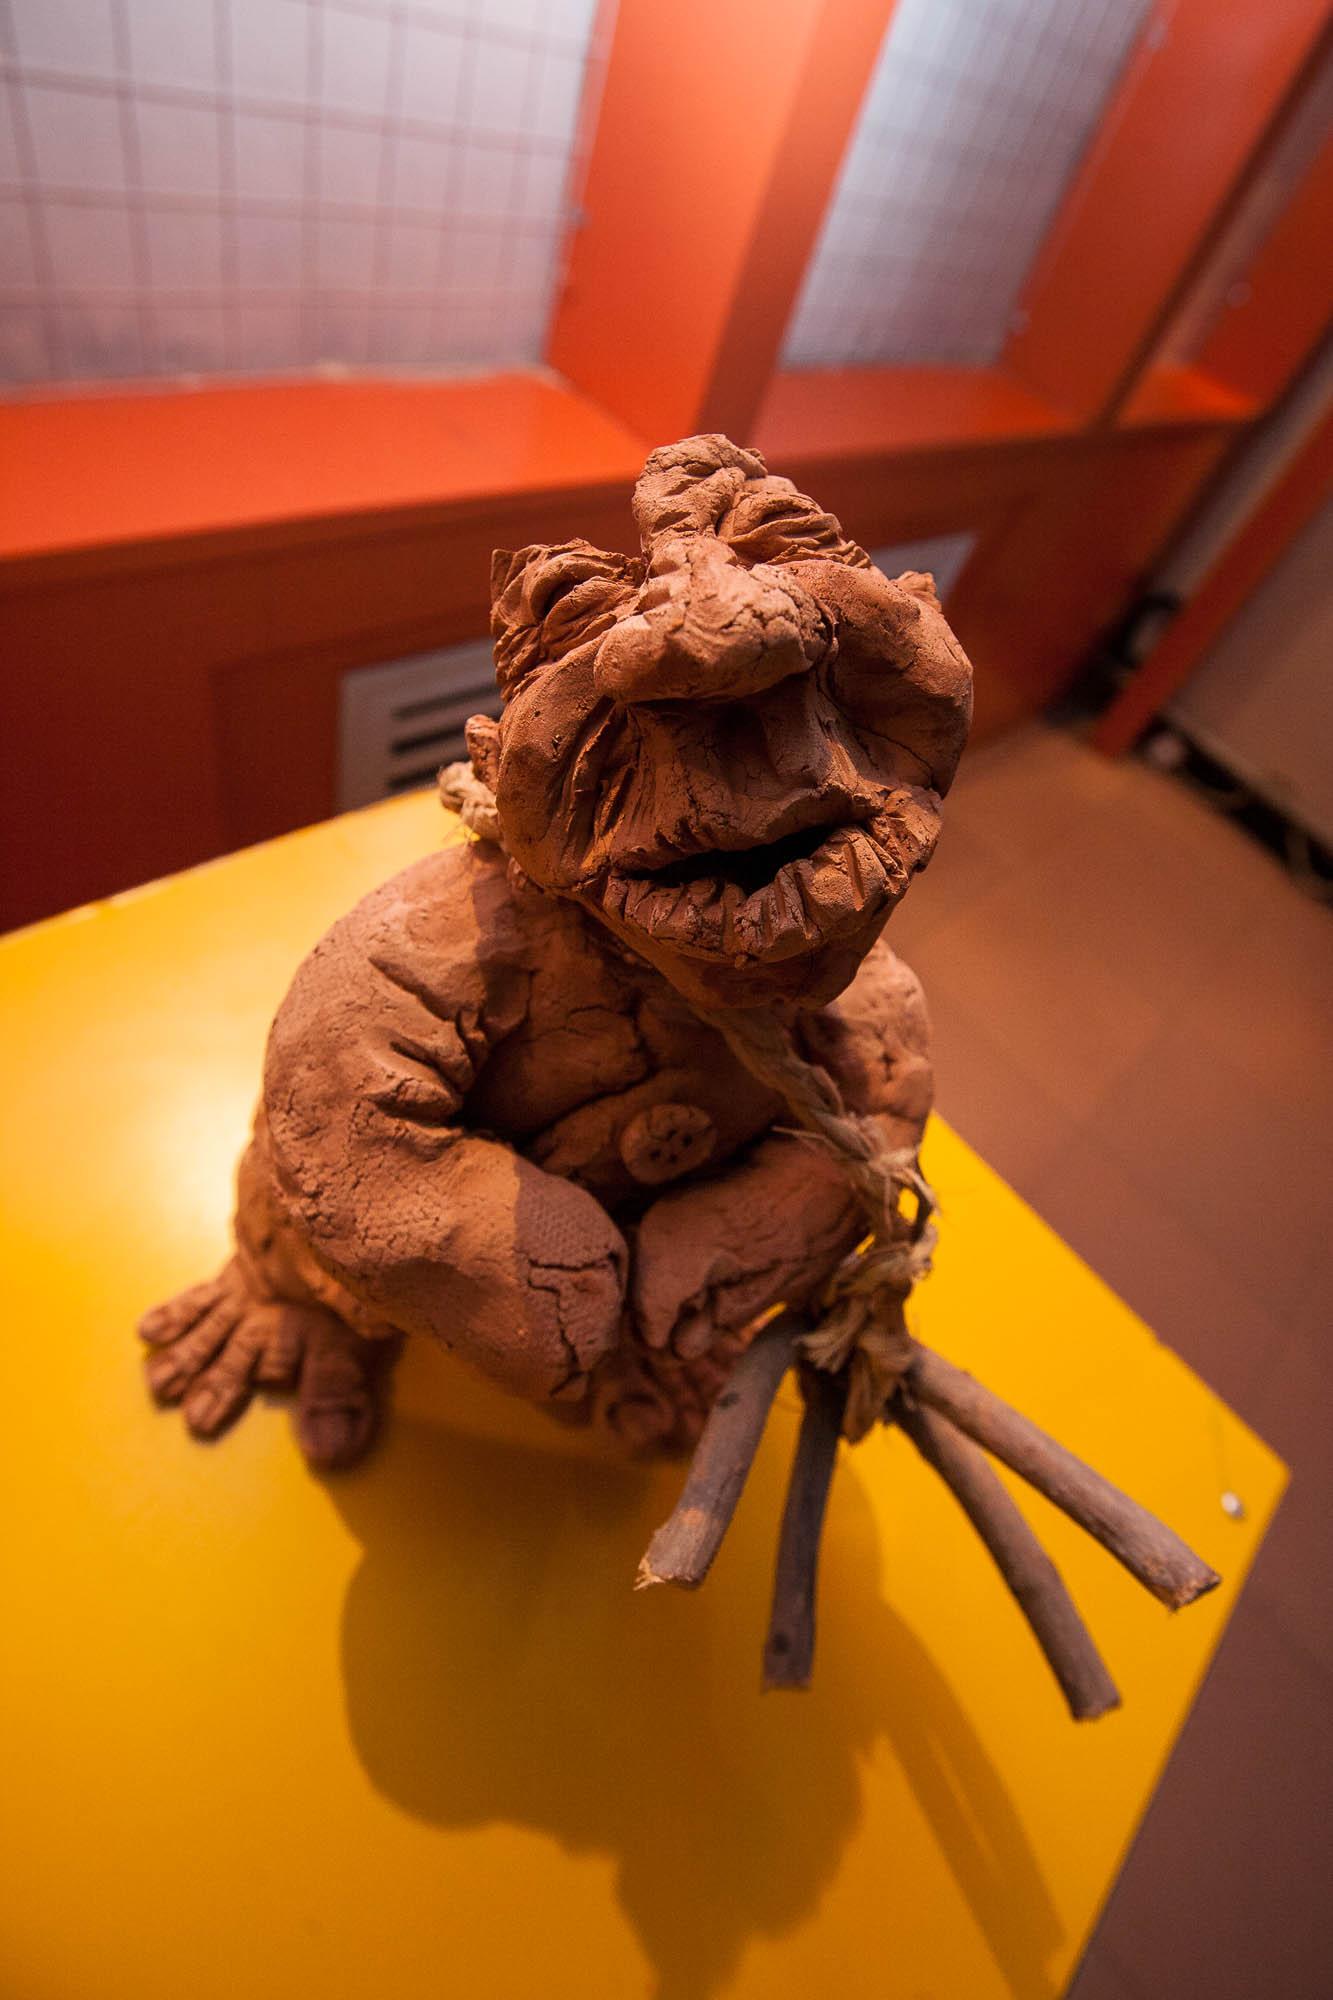 clay person